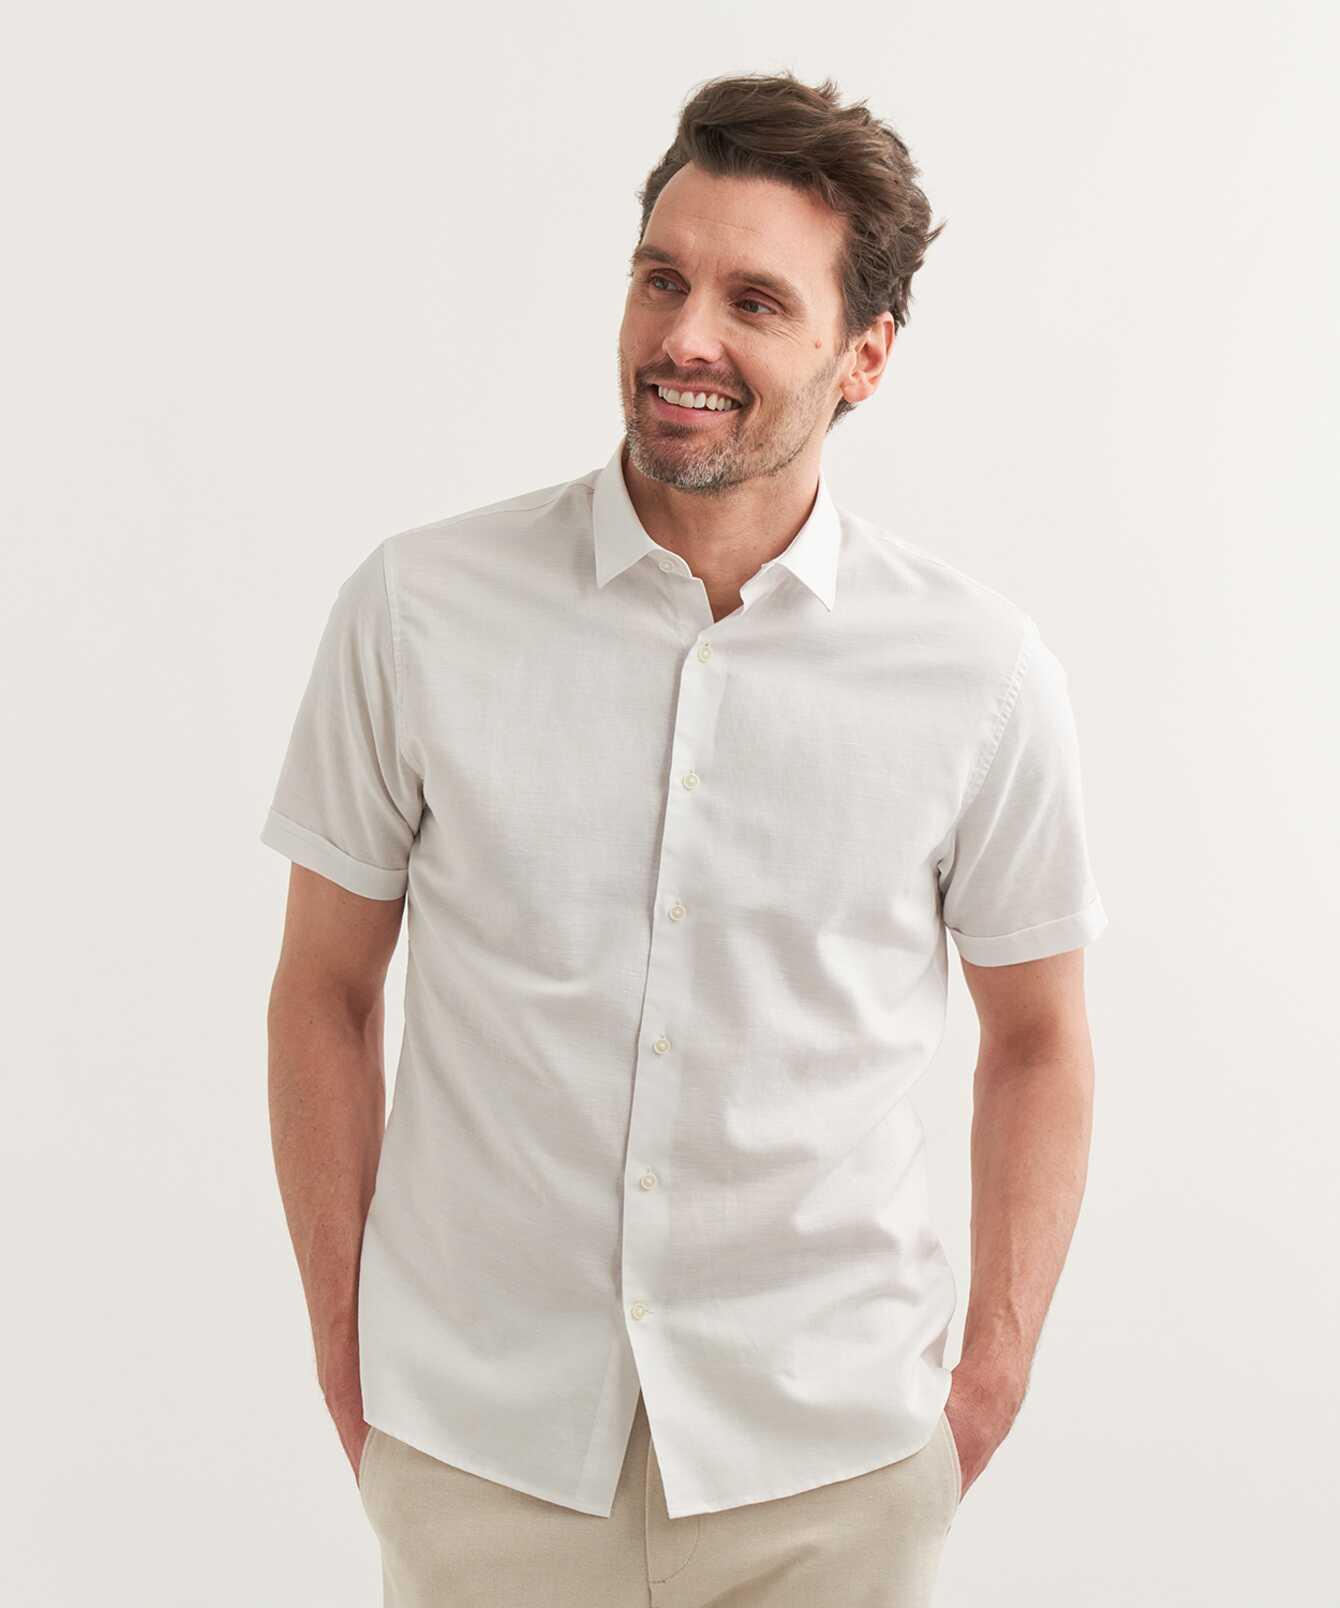 Skjorta Portofino Linne Kortärmad Vit  The Shirt Factory